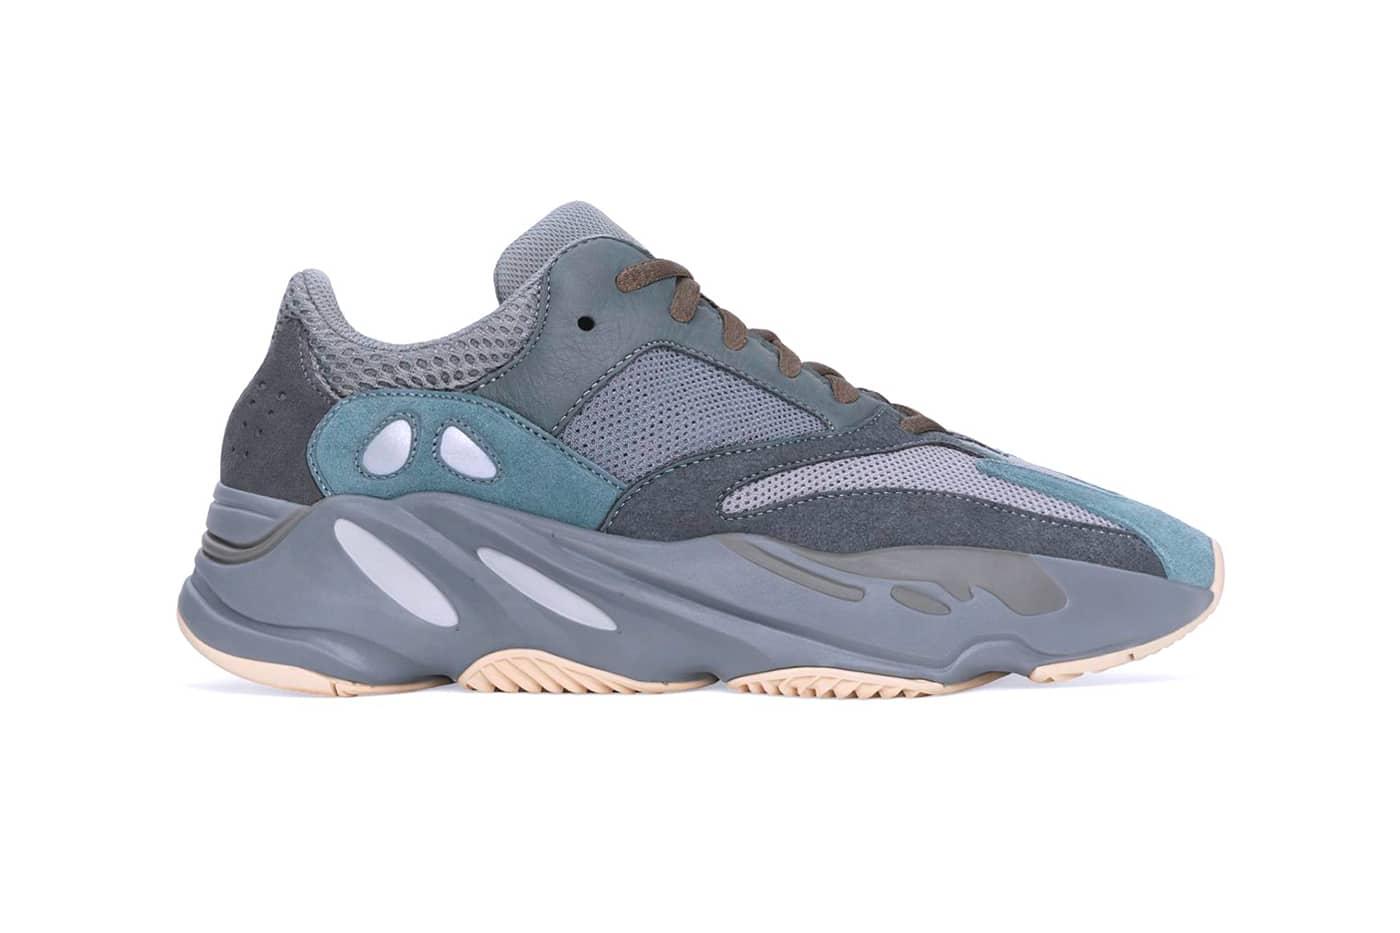 adidas YEEZY BOOST 700 Teal Blue releasedatum